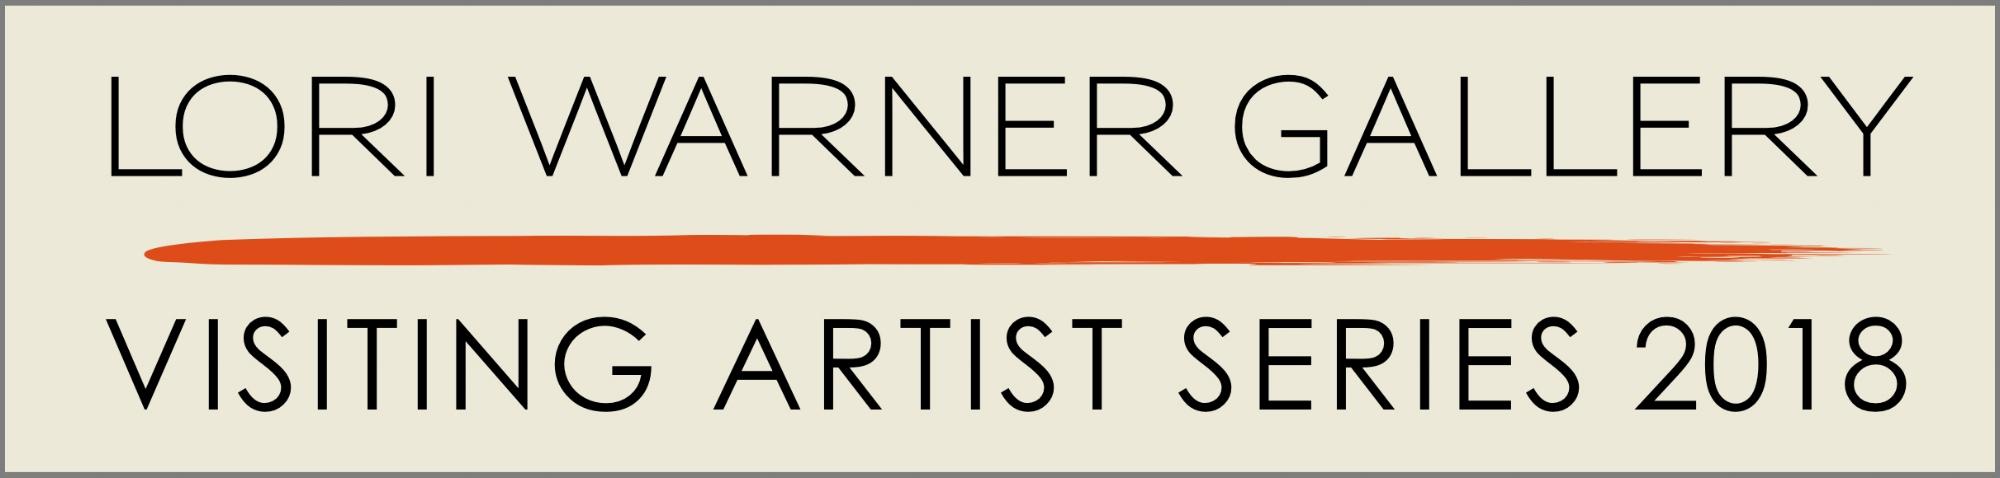 Visiting Artist Series Logo 2018.jpg